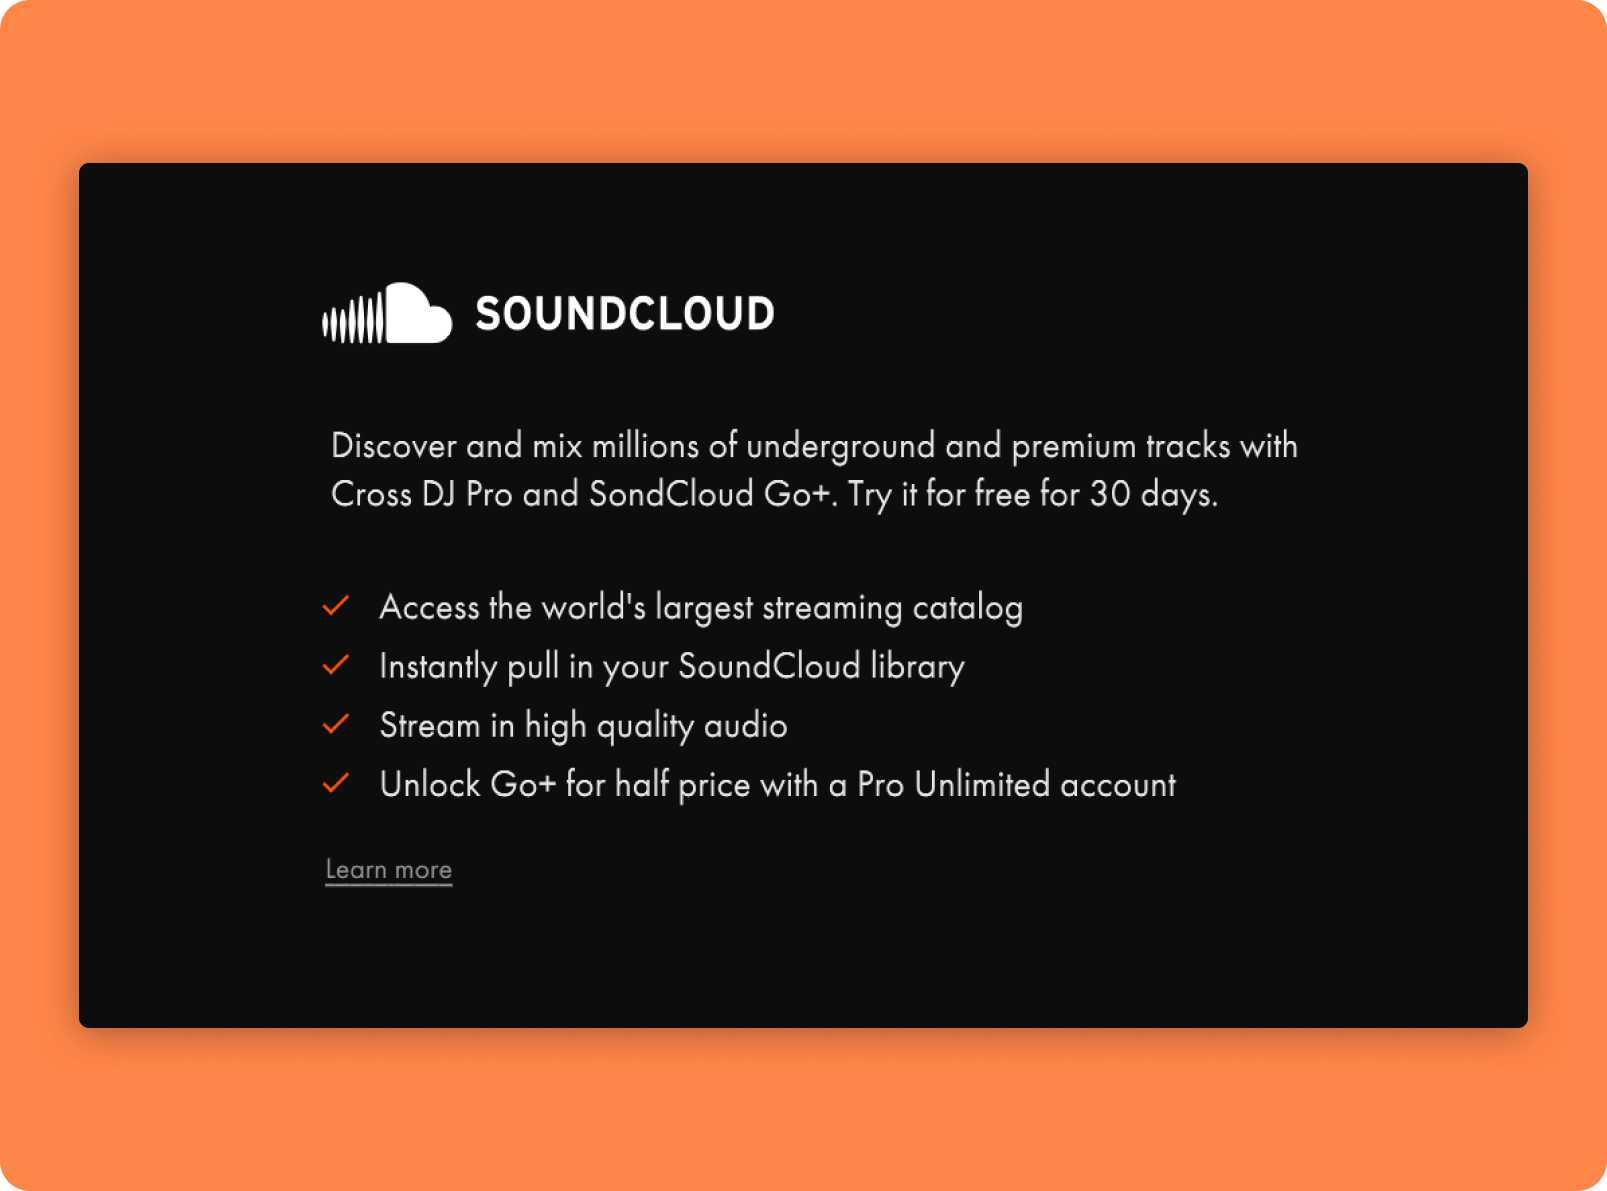 Cross DJ's Soundcloud Go+ integration